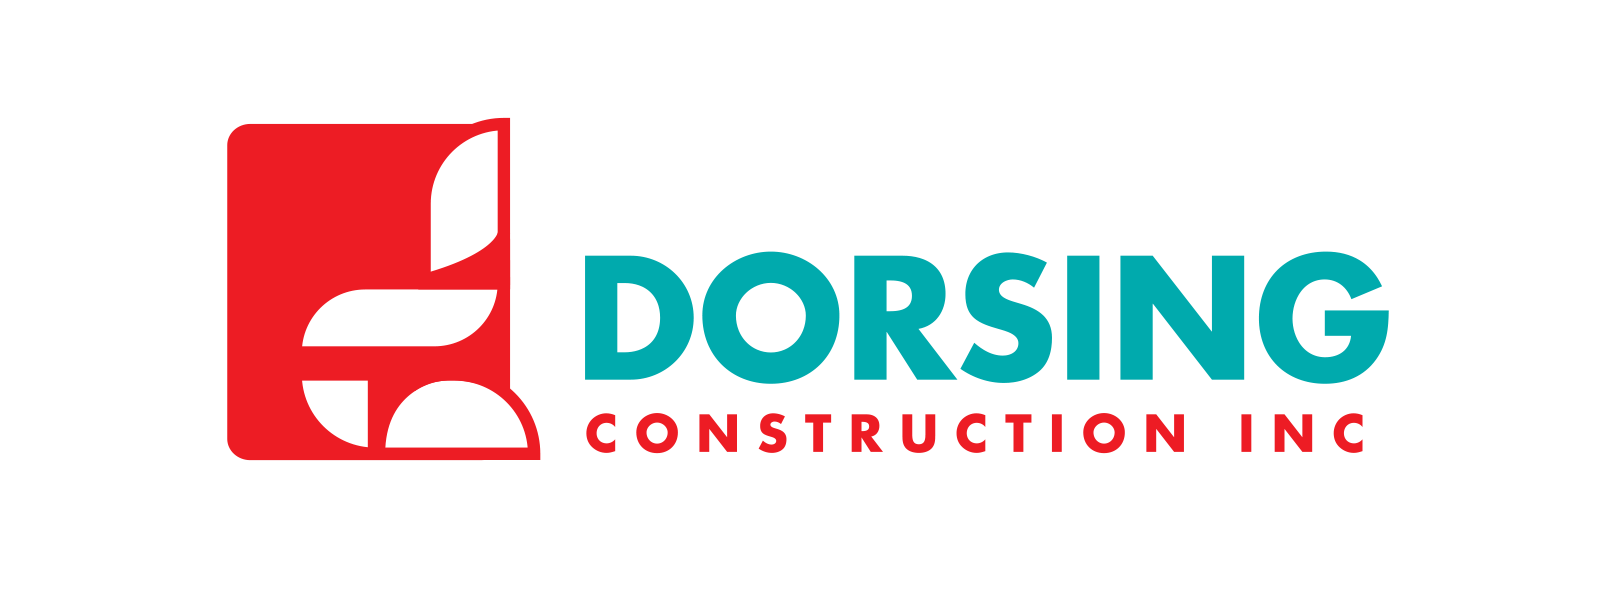 Dorsing Construction Logo Graphics Byte